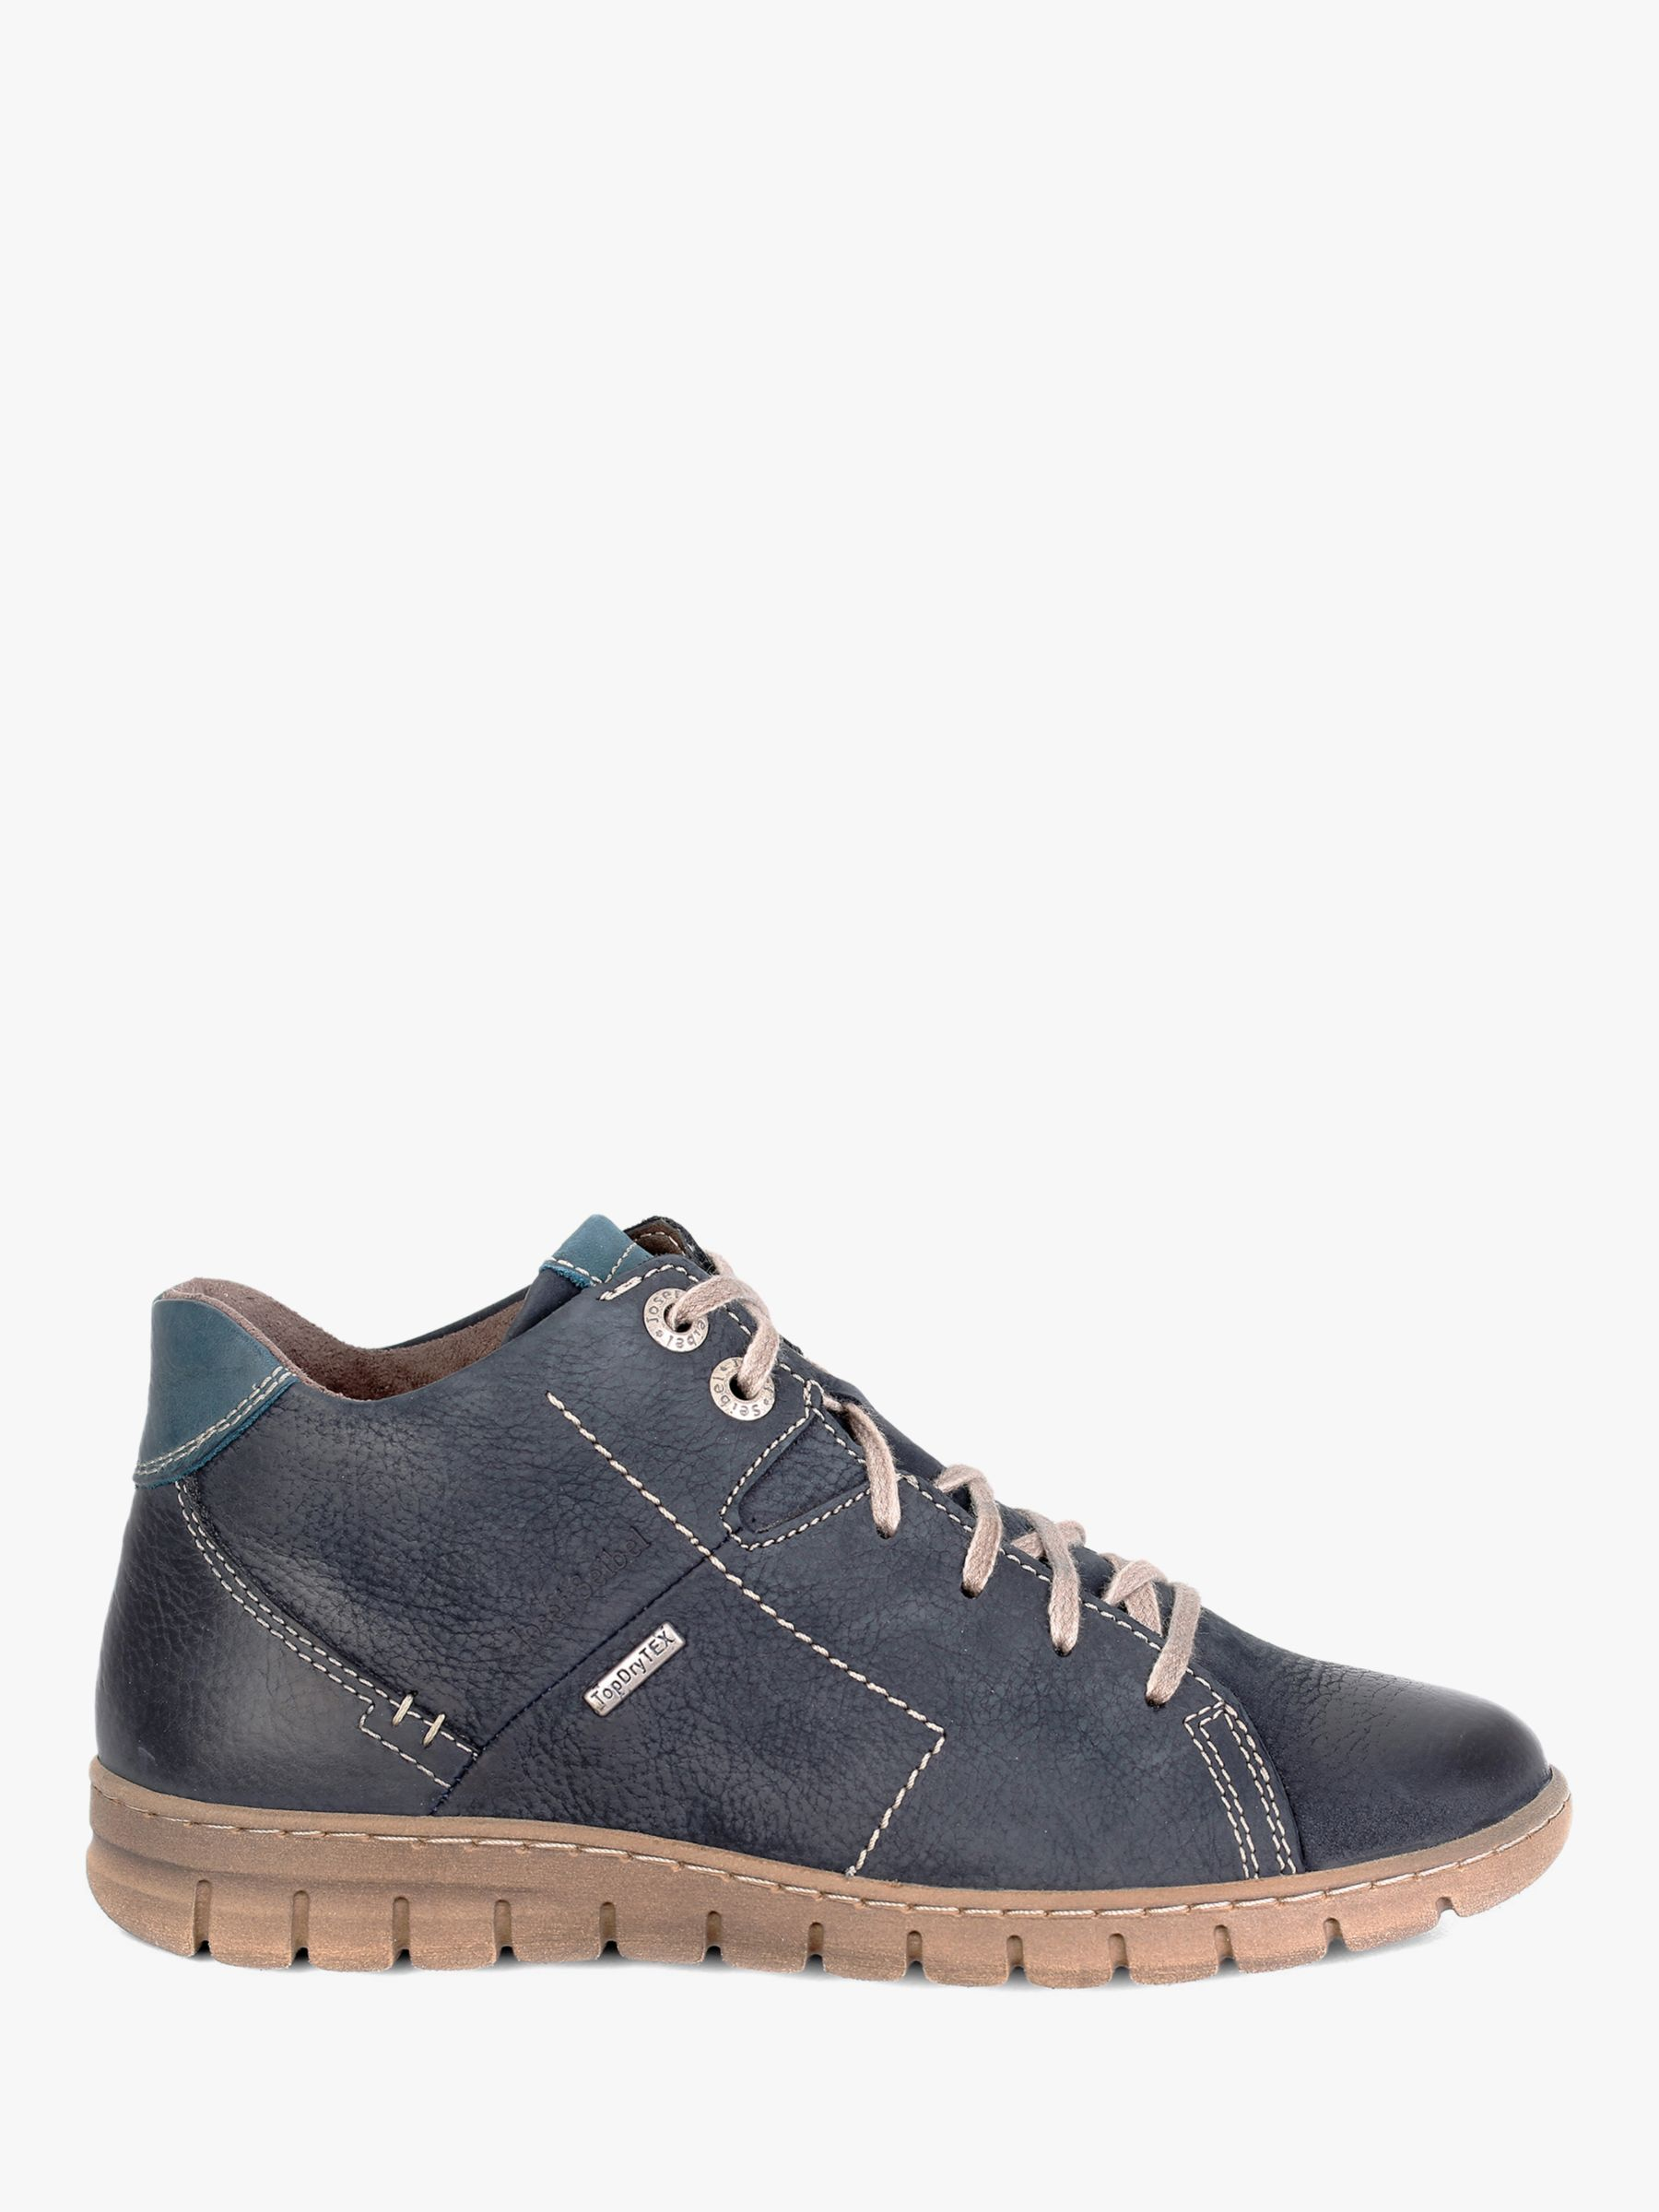 Josef Seibel Josef Seibel Steffi 58 Leather Ankle Boots, Blue